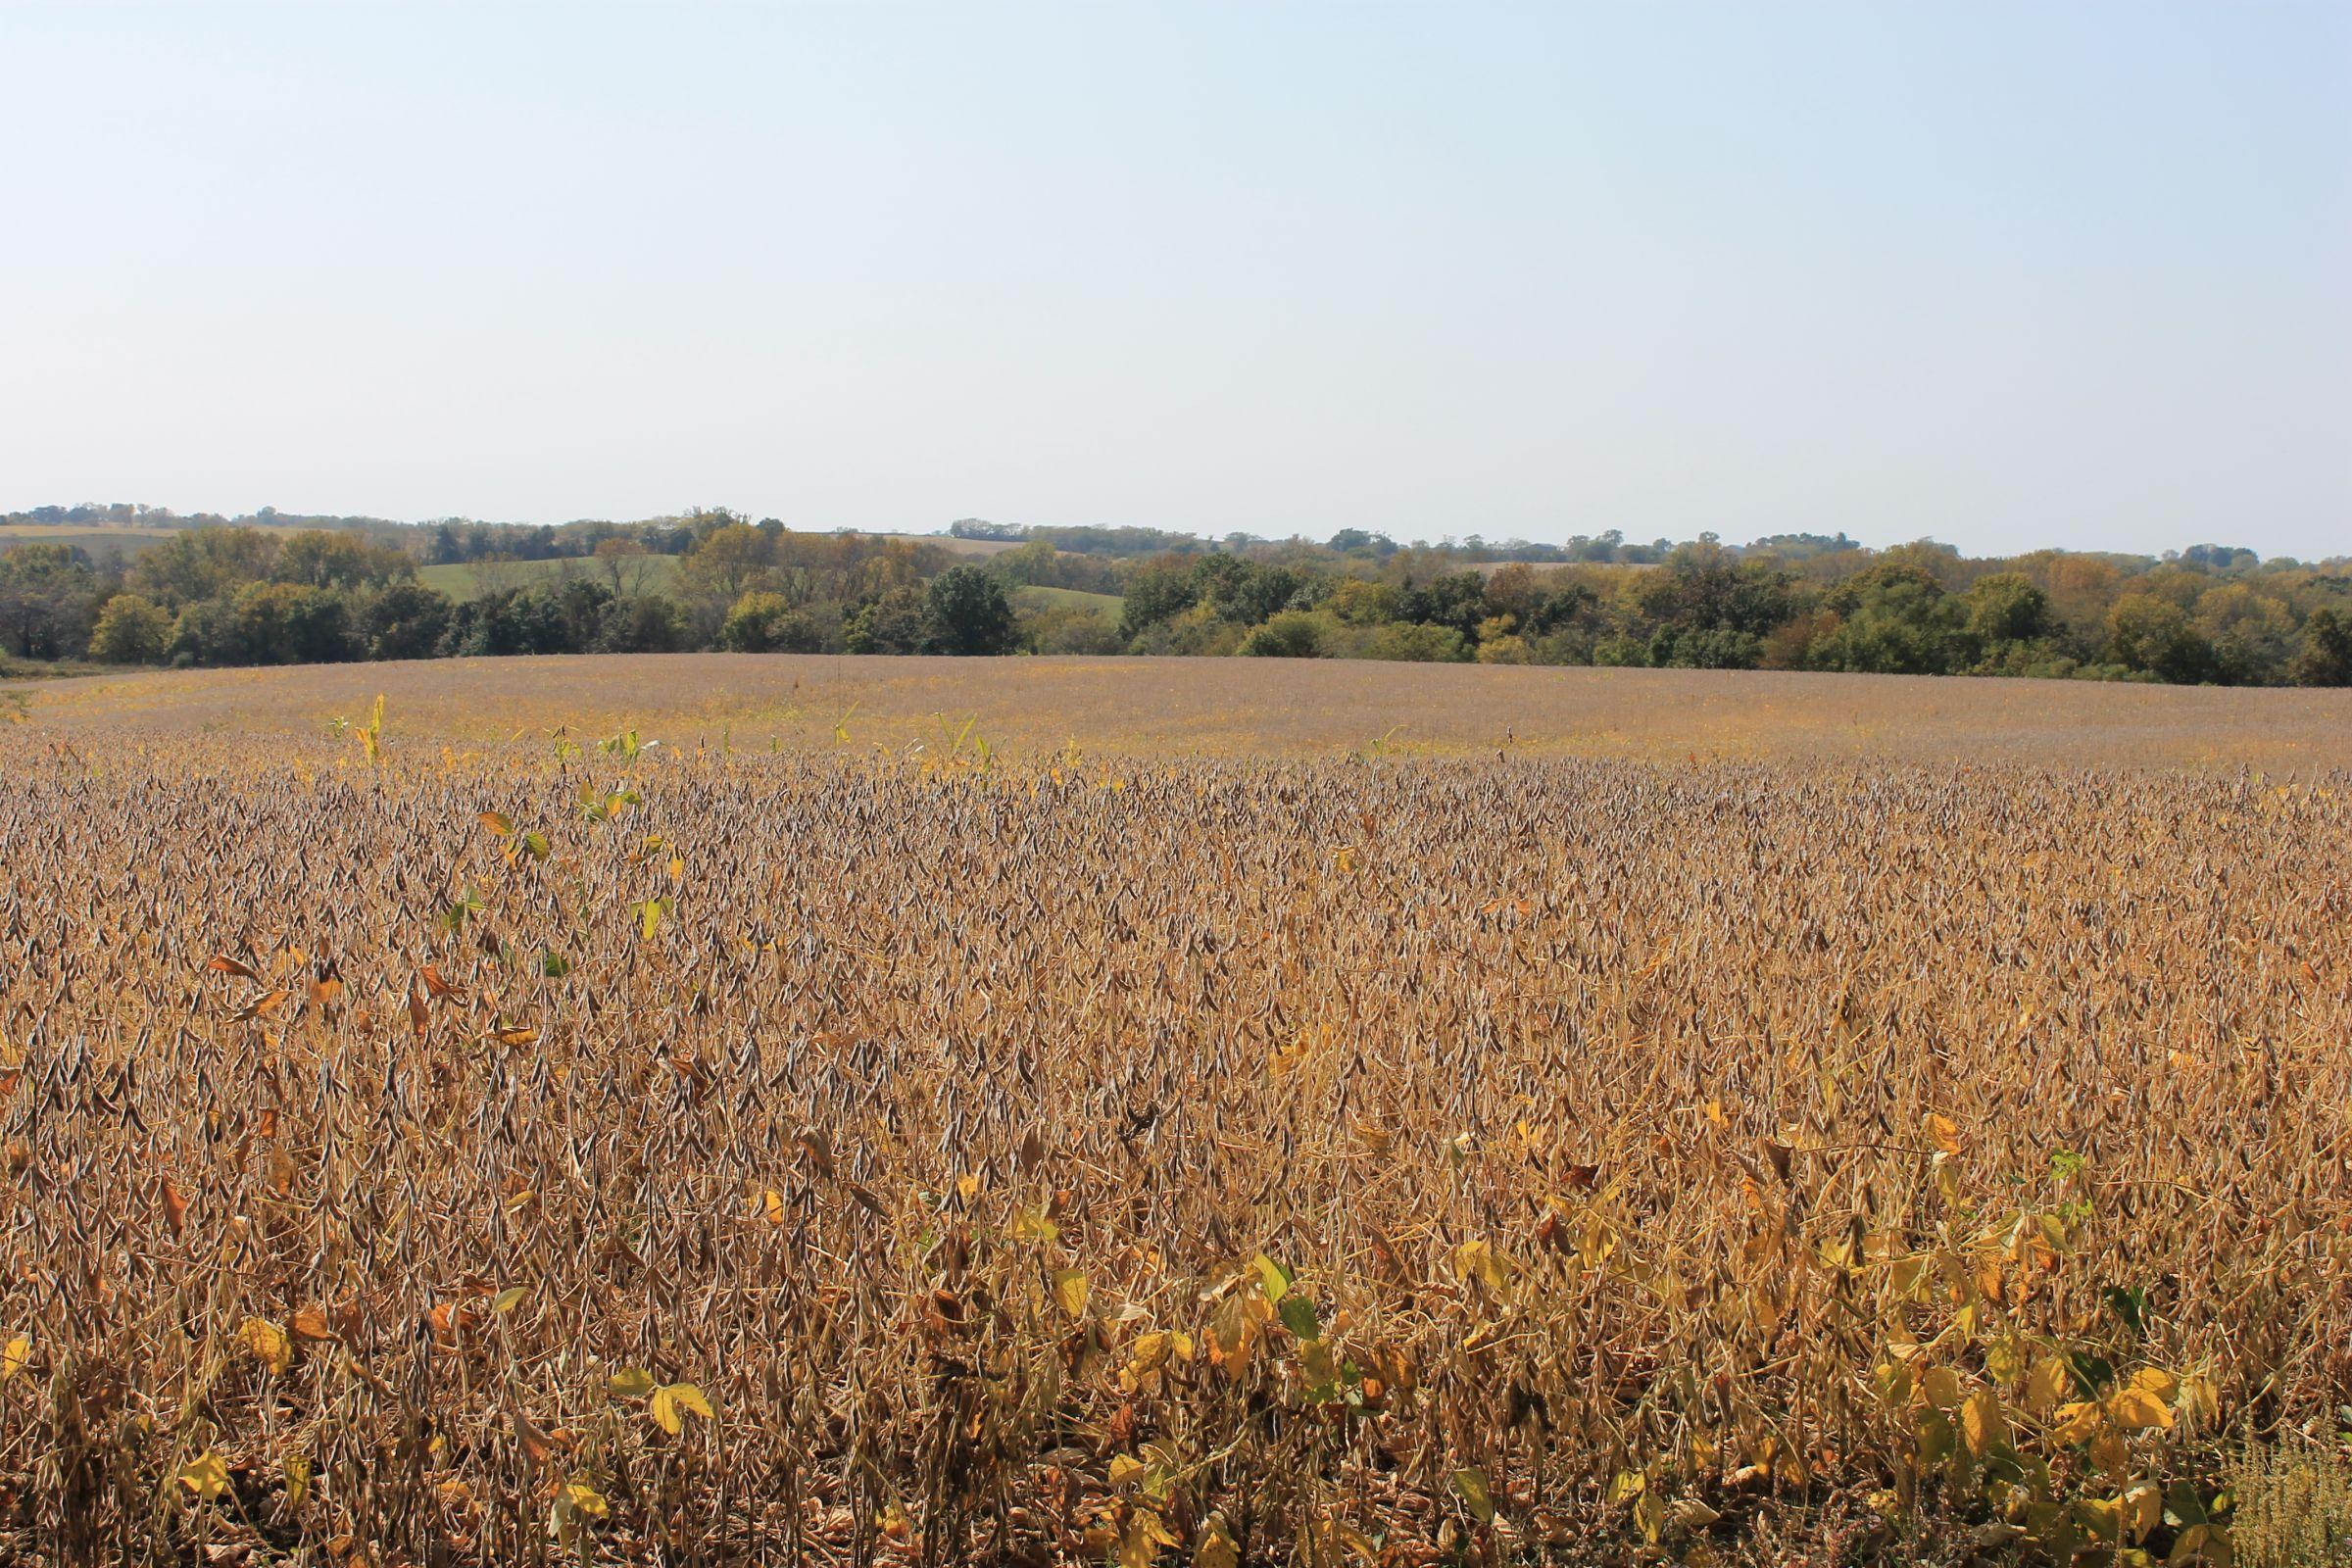 land-sullivan-county-missouri-853-acres-listing-number-15279-0-2020-12-18-135139.JPG